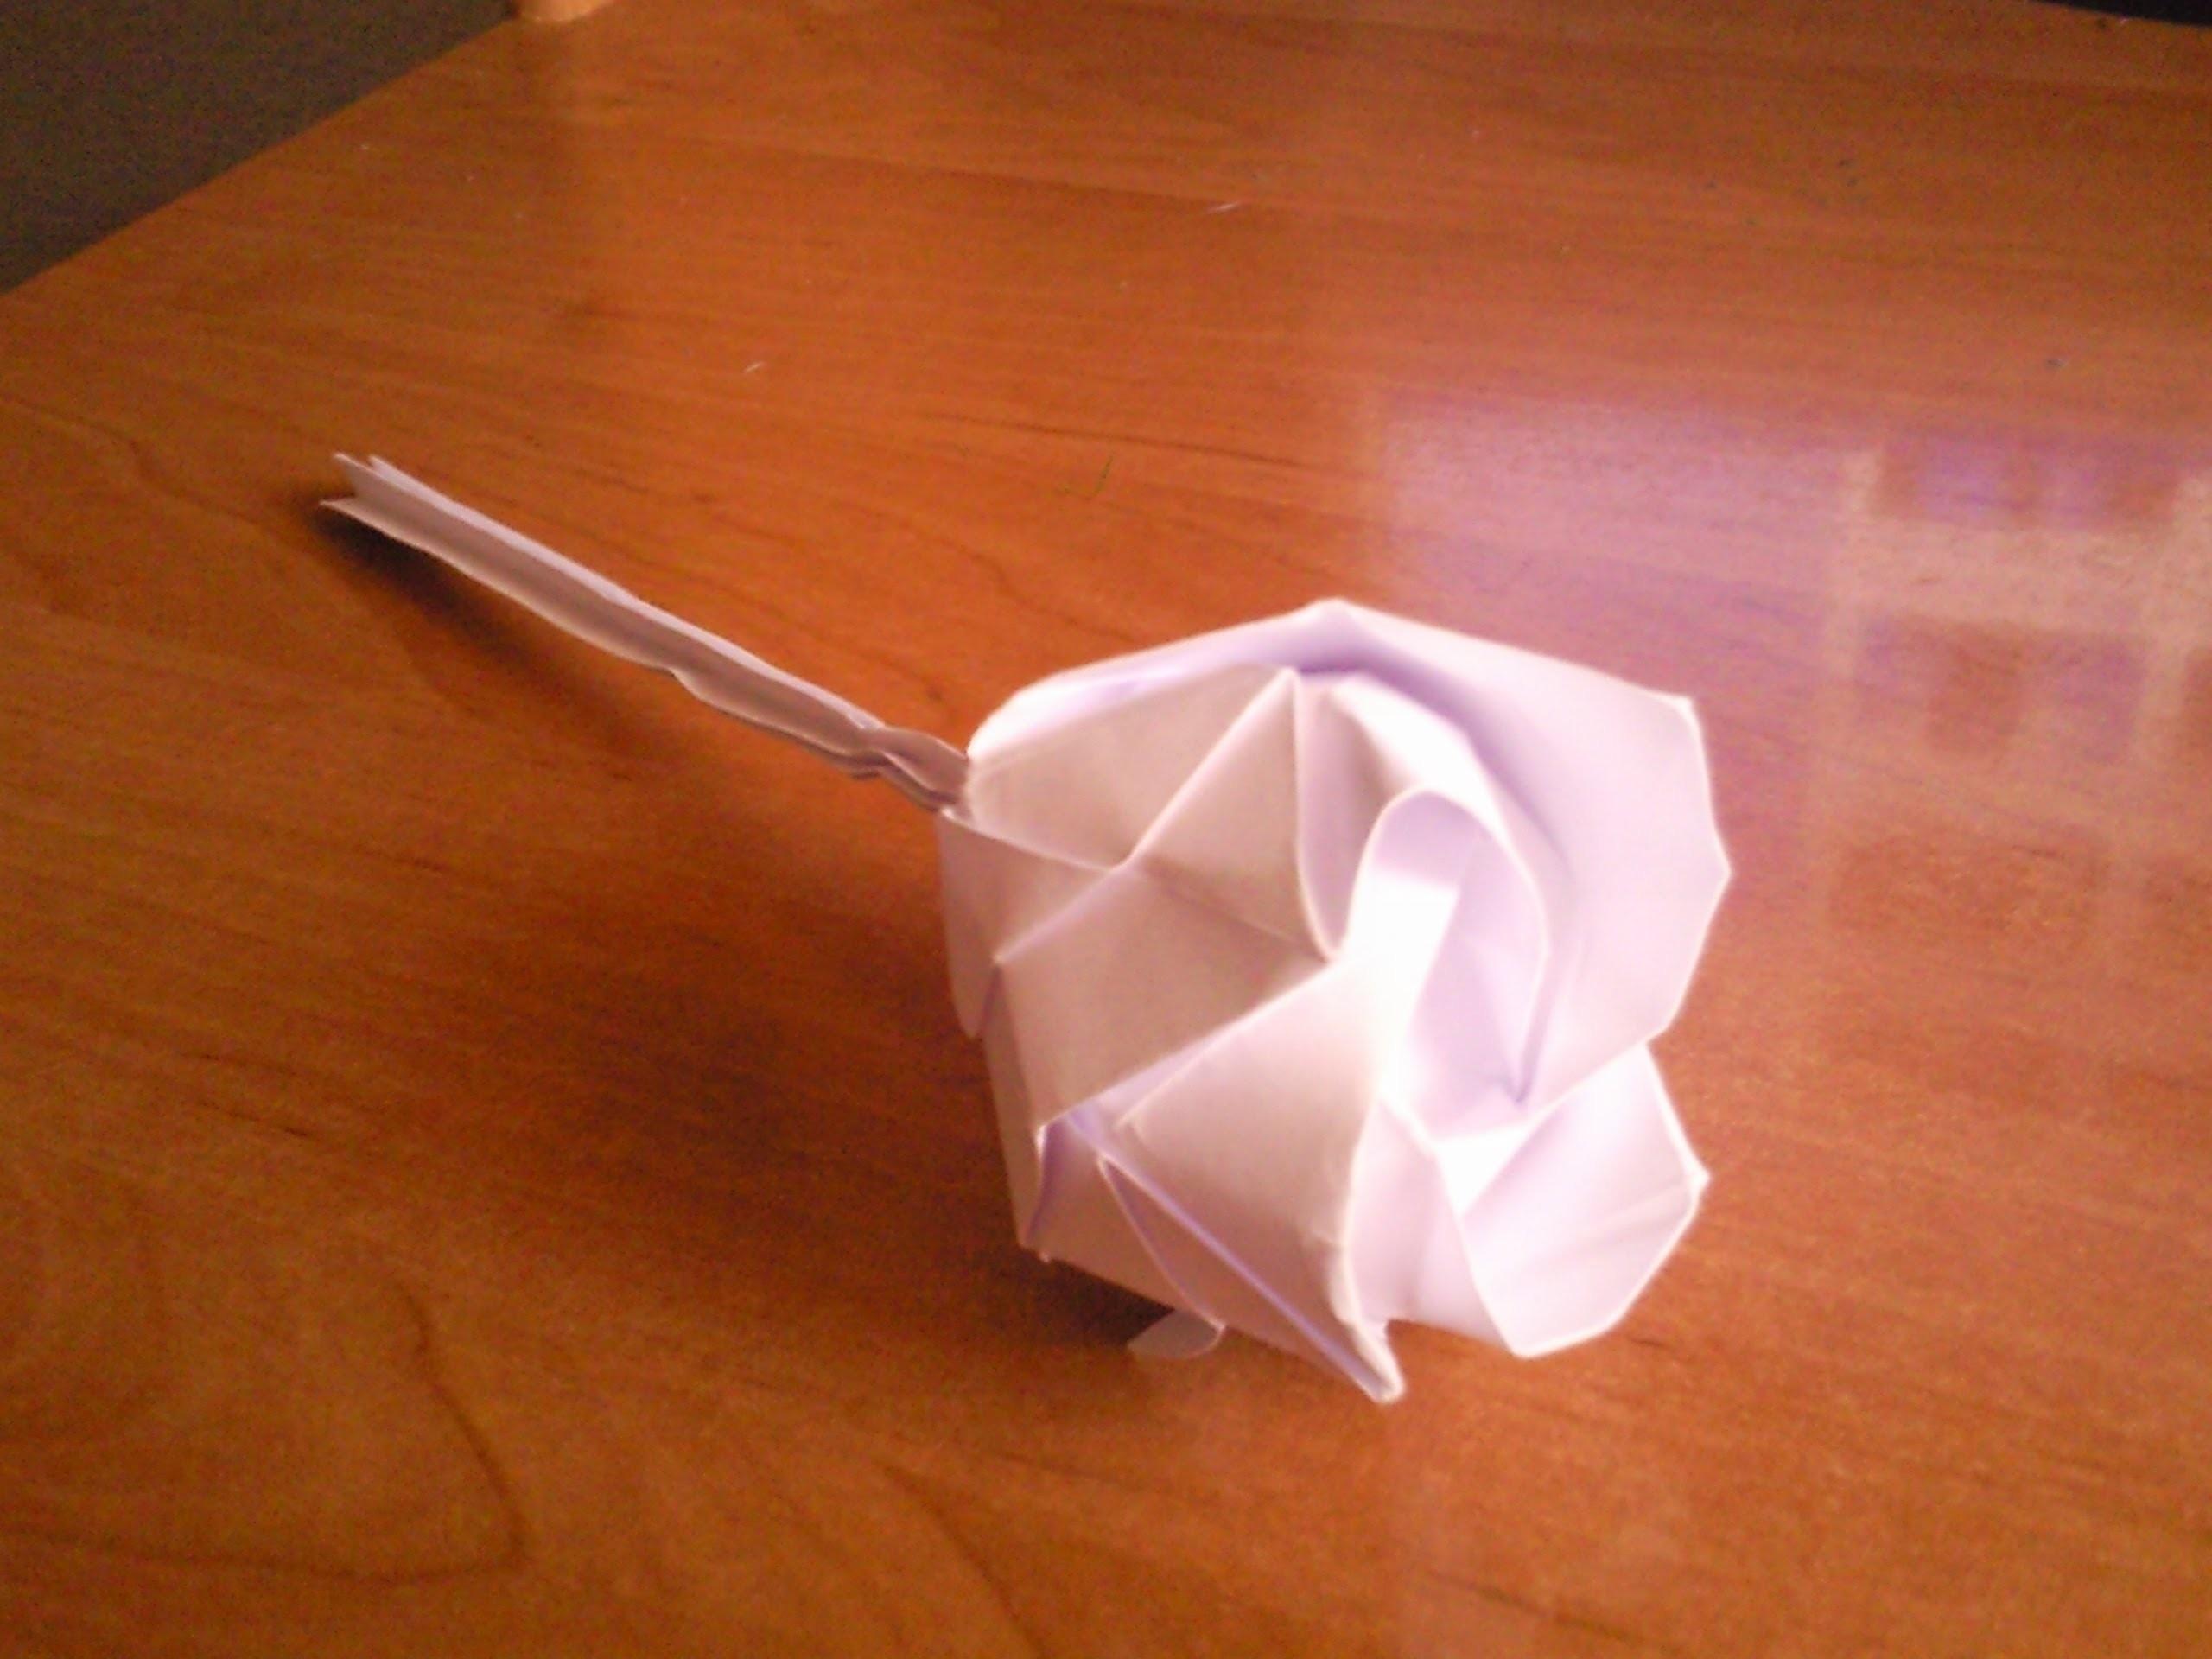 Origami Rózsa (Rose) Tutorial - photo#9